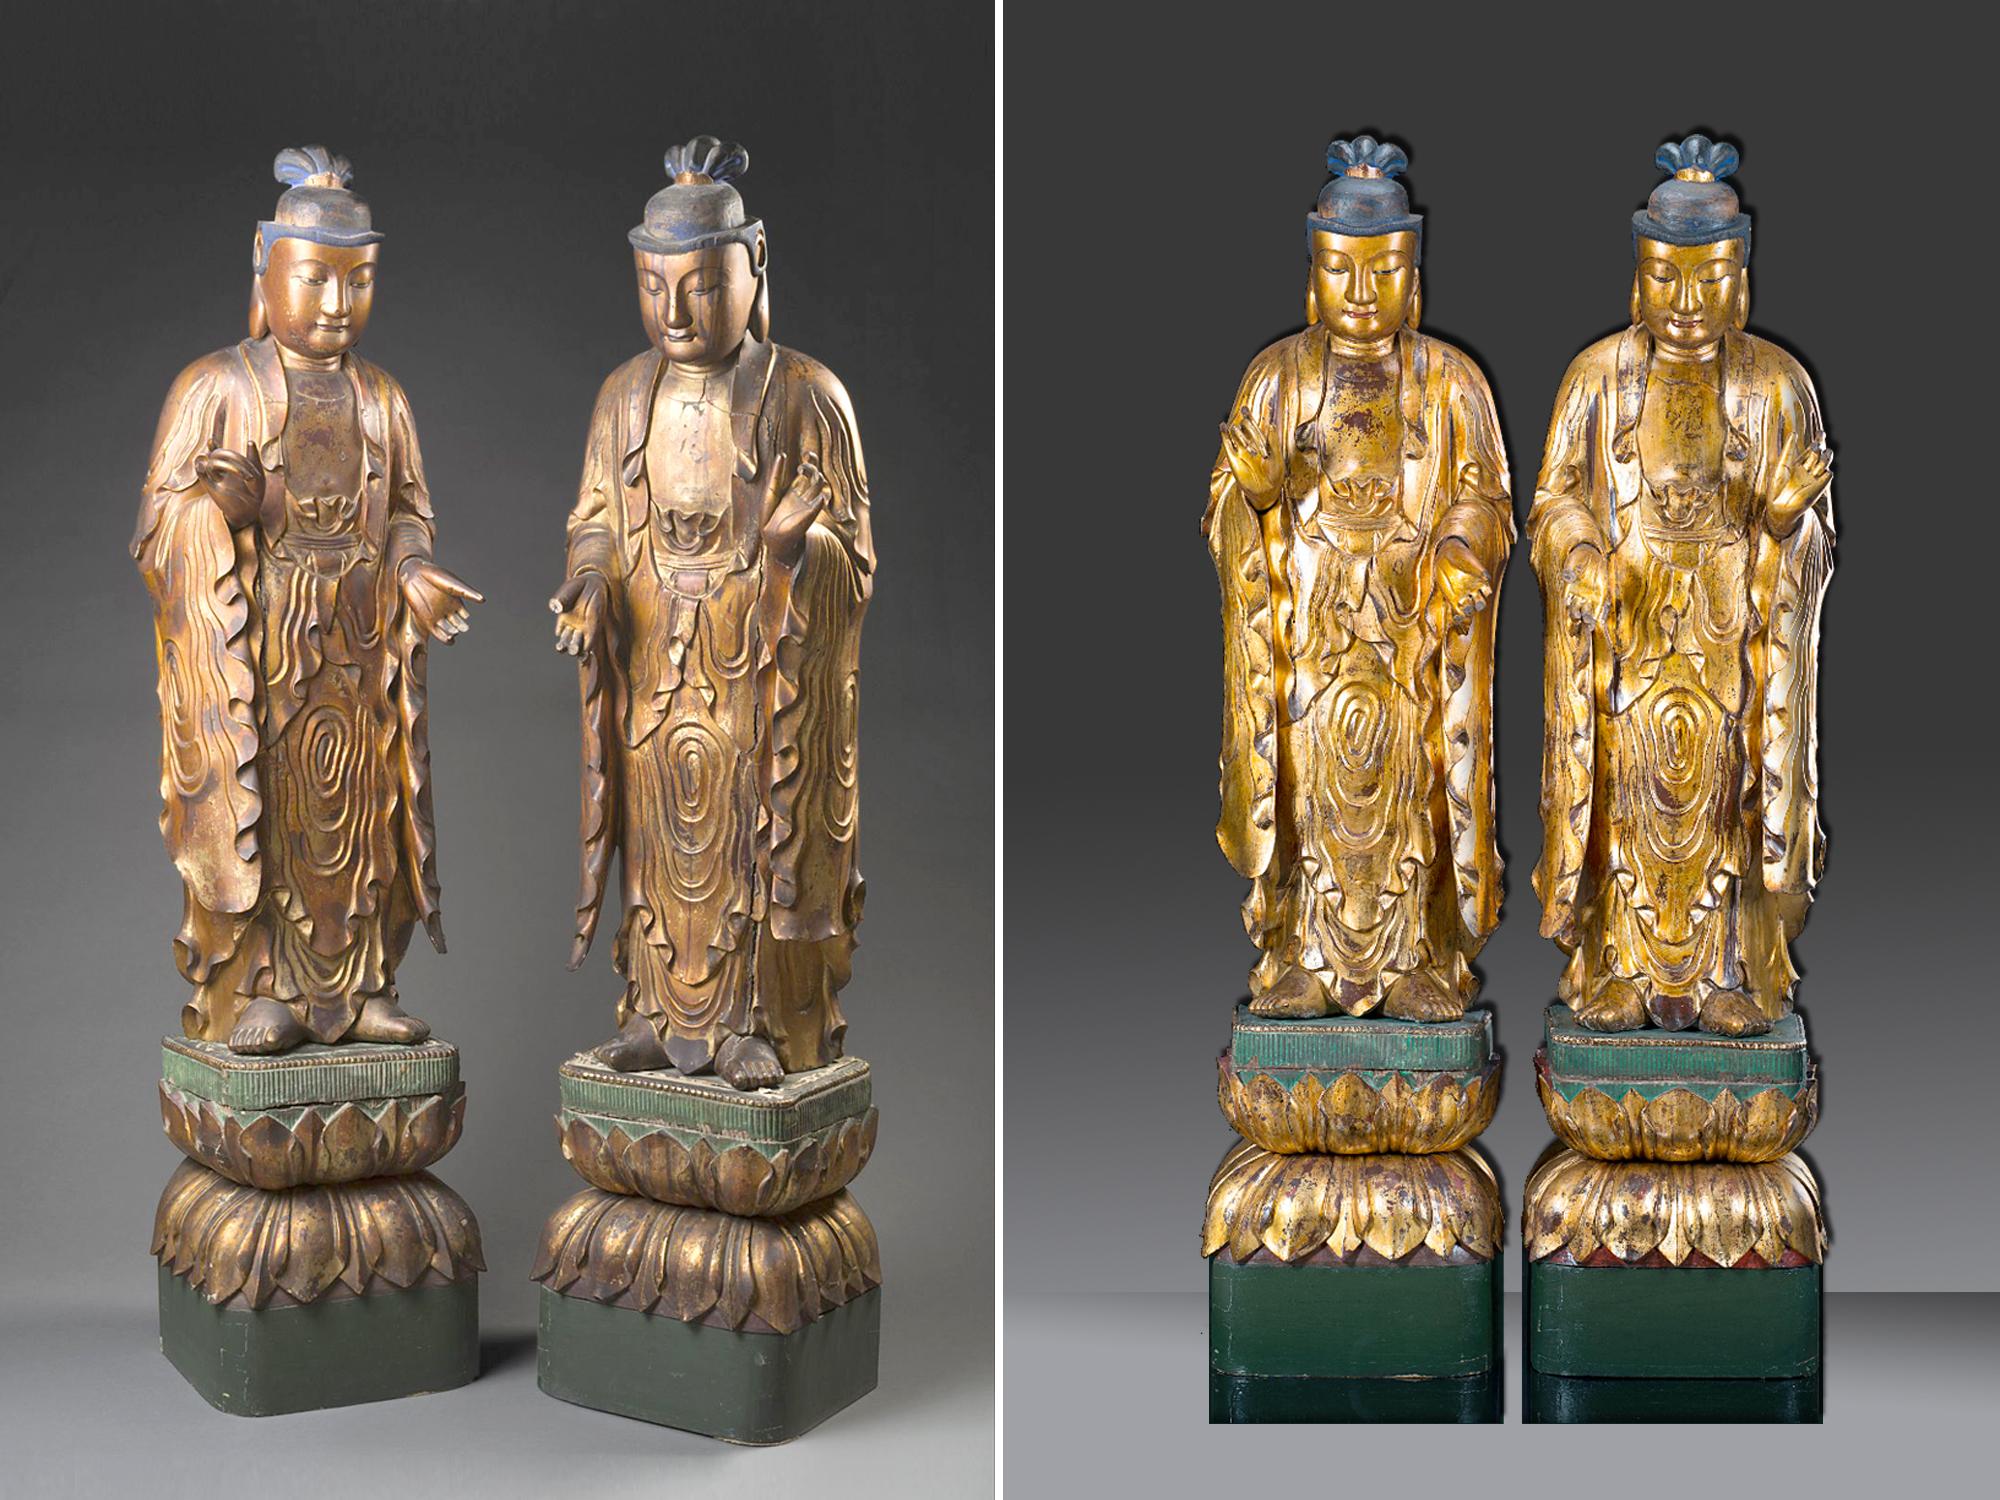 restauro coppia bodhisattva cinesi confronto